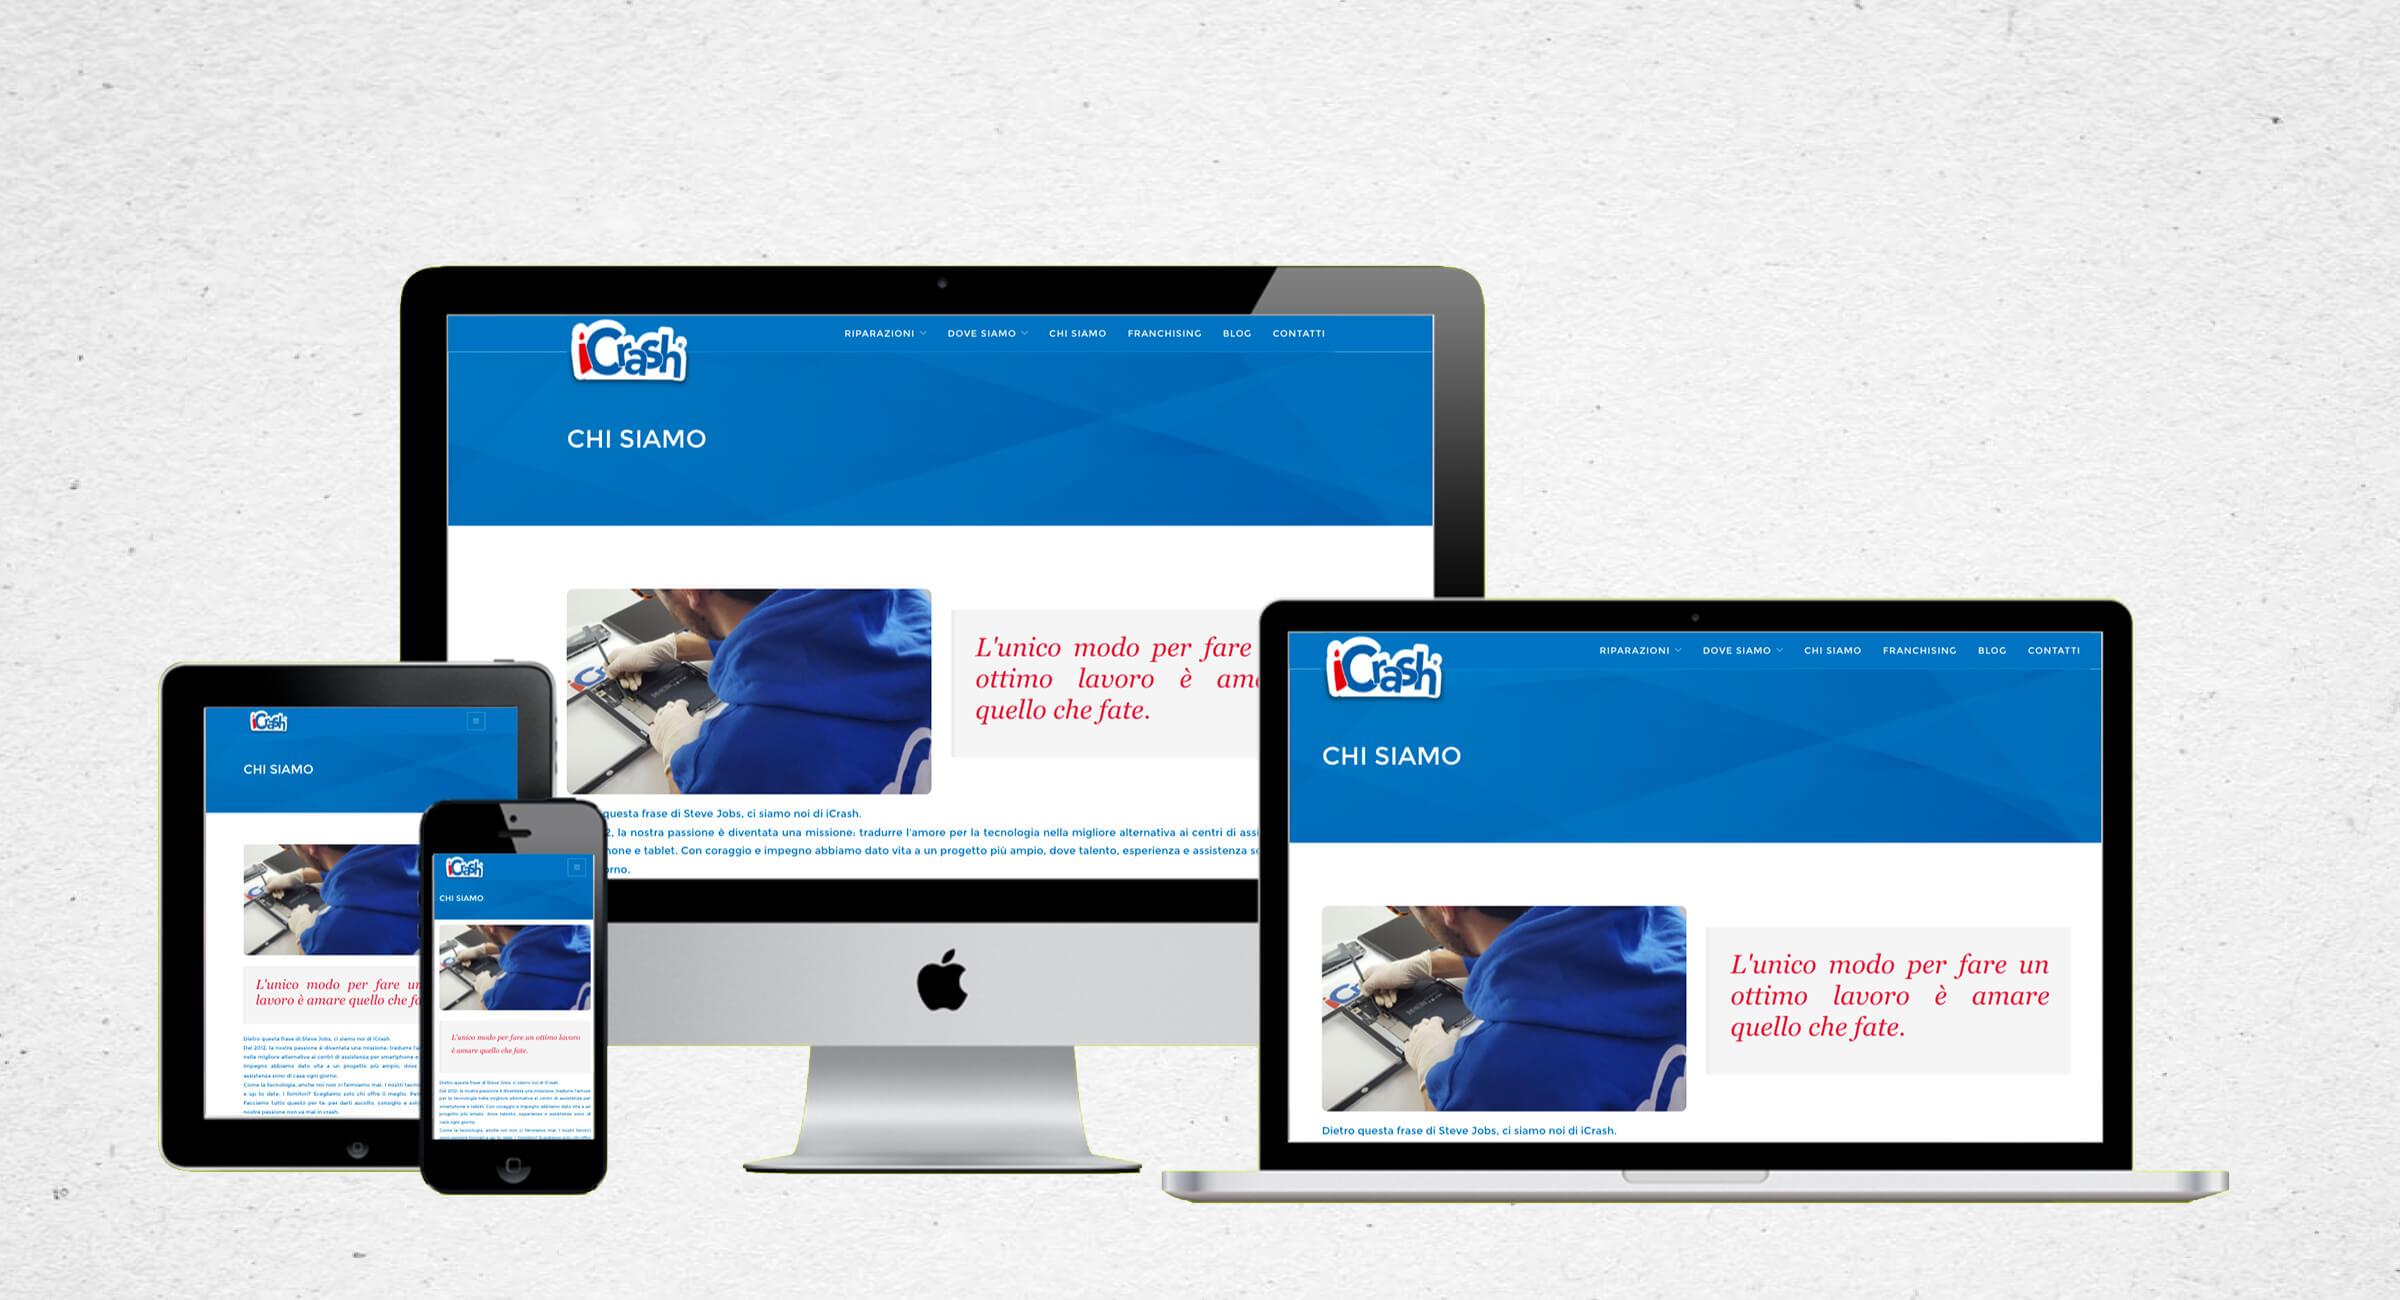 OnOff-Communication-per-iCrash-web-site